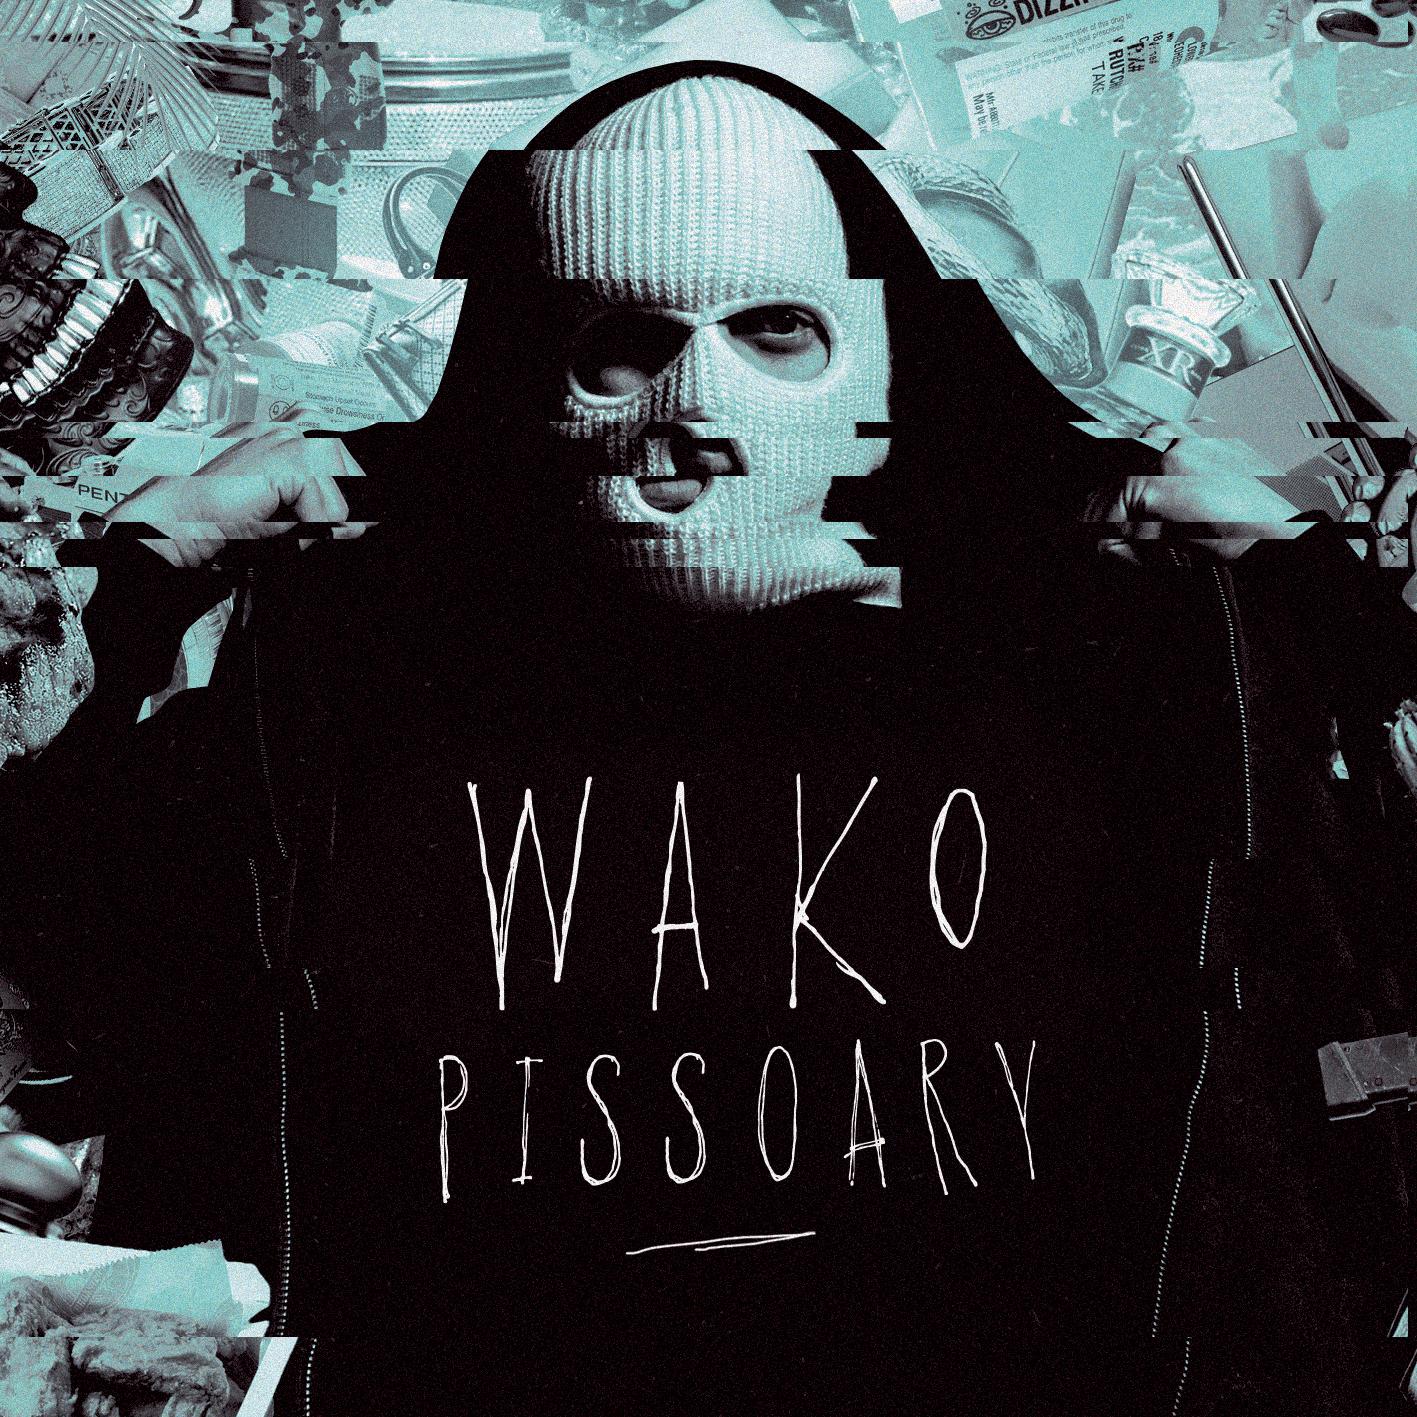 Wako_Pissoary_Cover_(1)